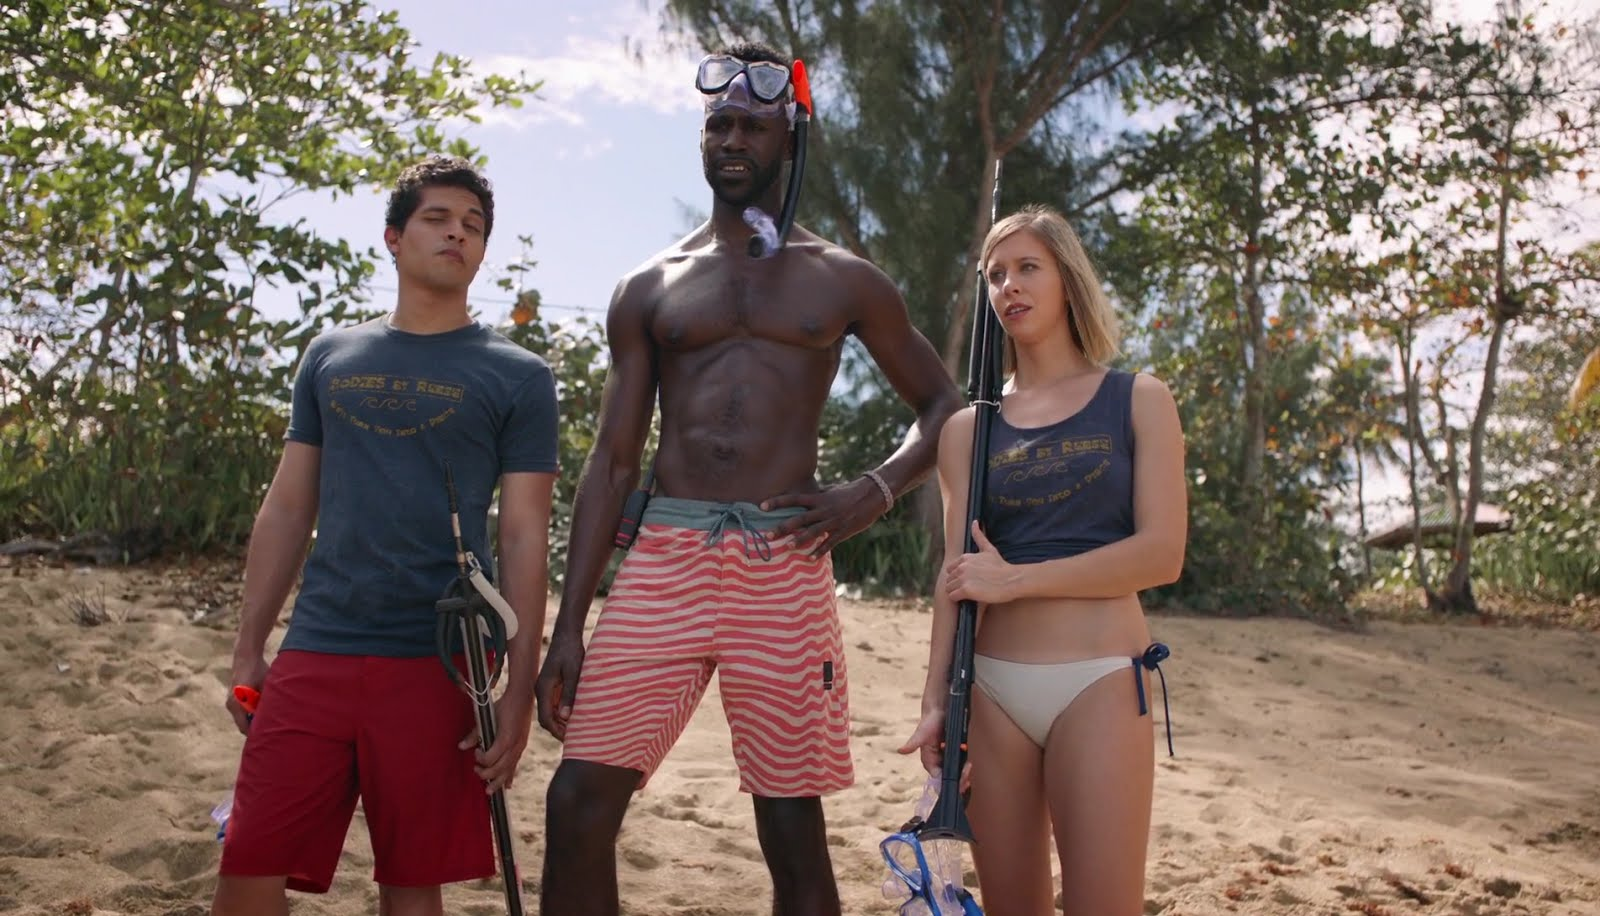 Allen Samuels Tyler >> Shirtless Men On The Blog: Bryce Durfee & Sean Samuels Shirtless